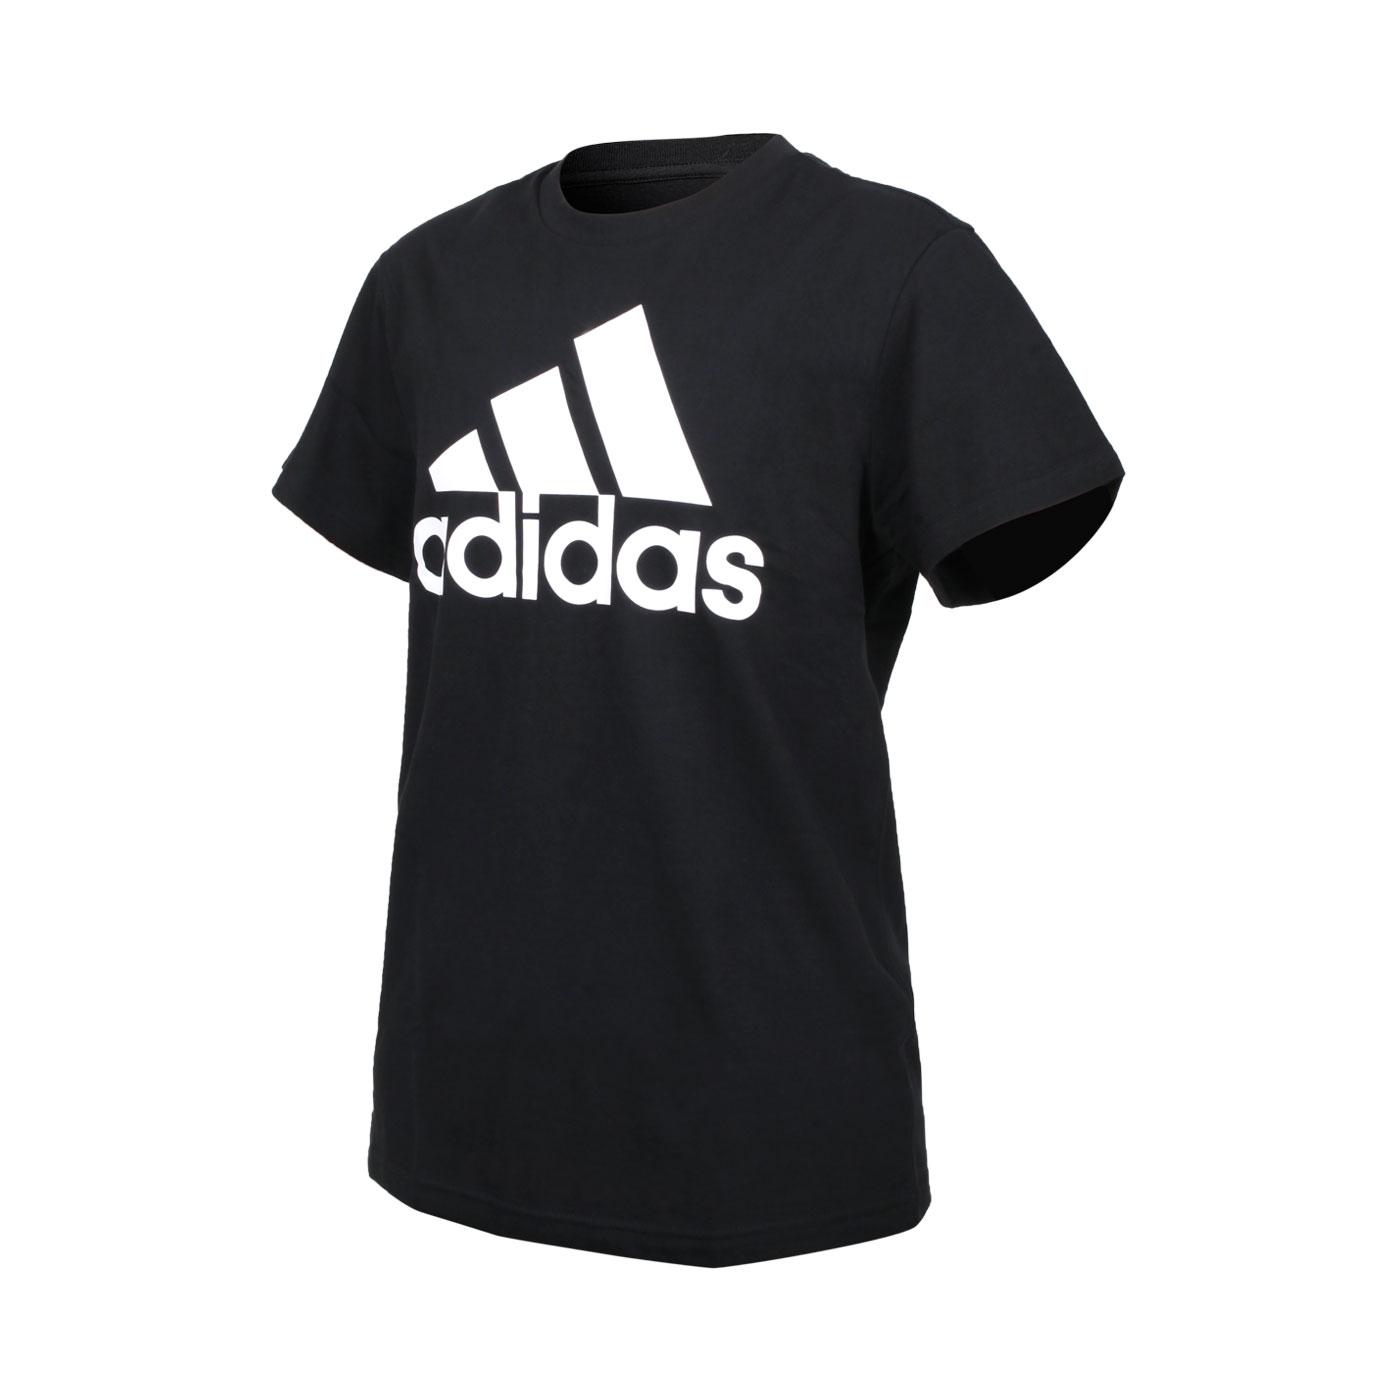 ADIDAS 女款短袖T恤 GL0781